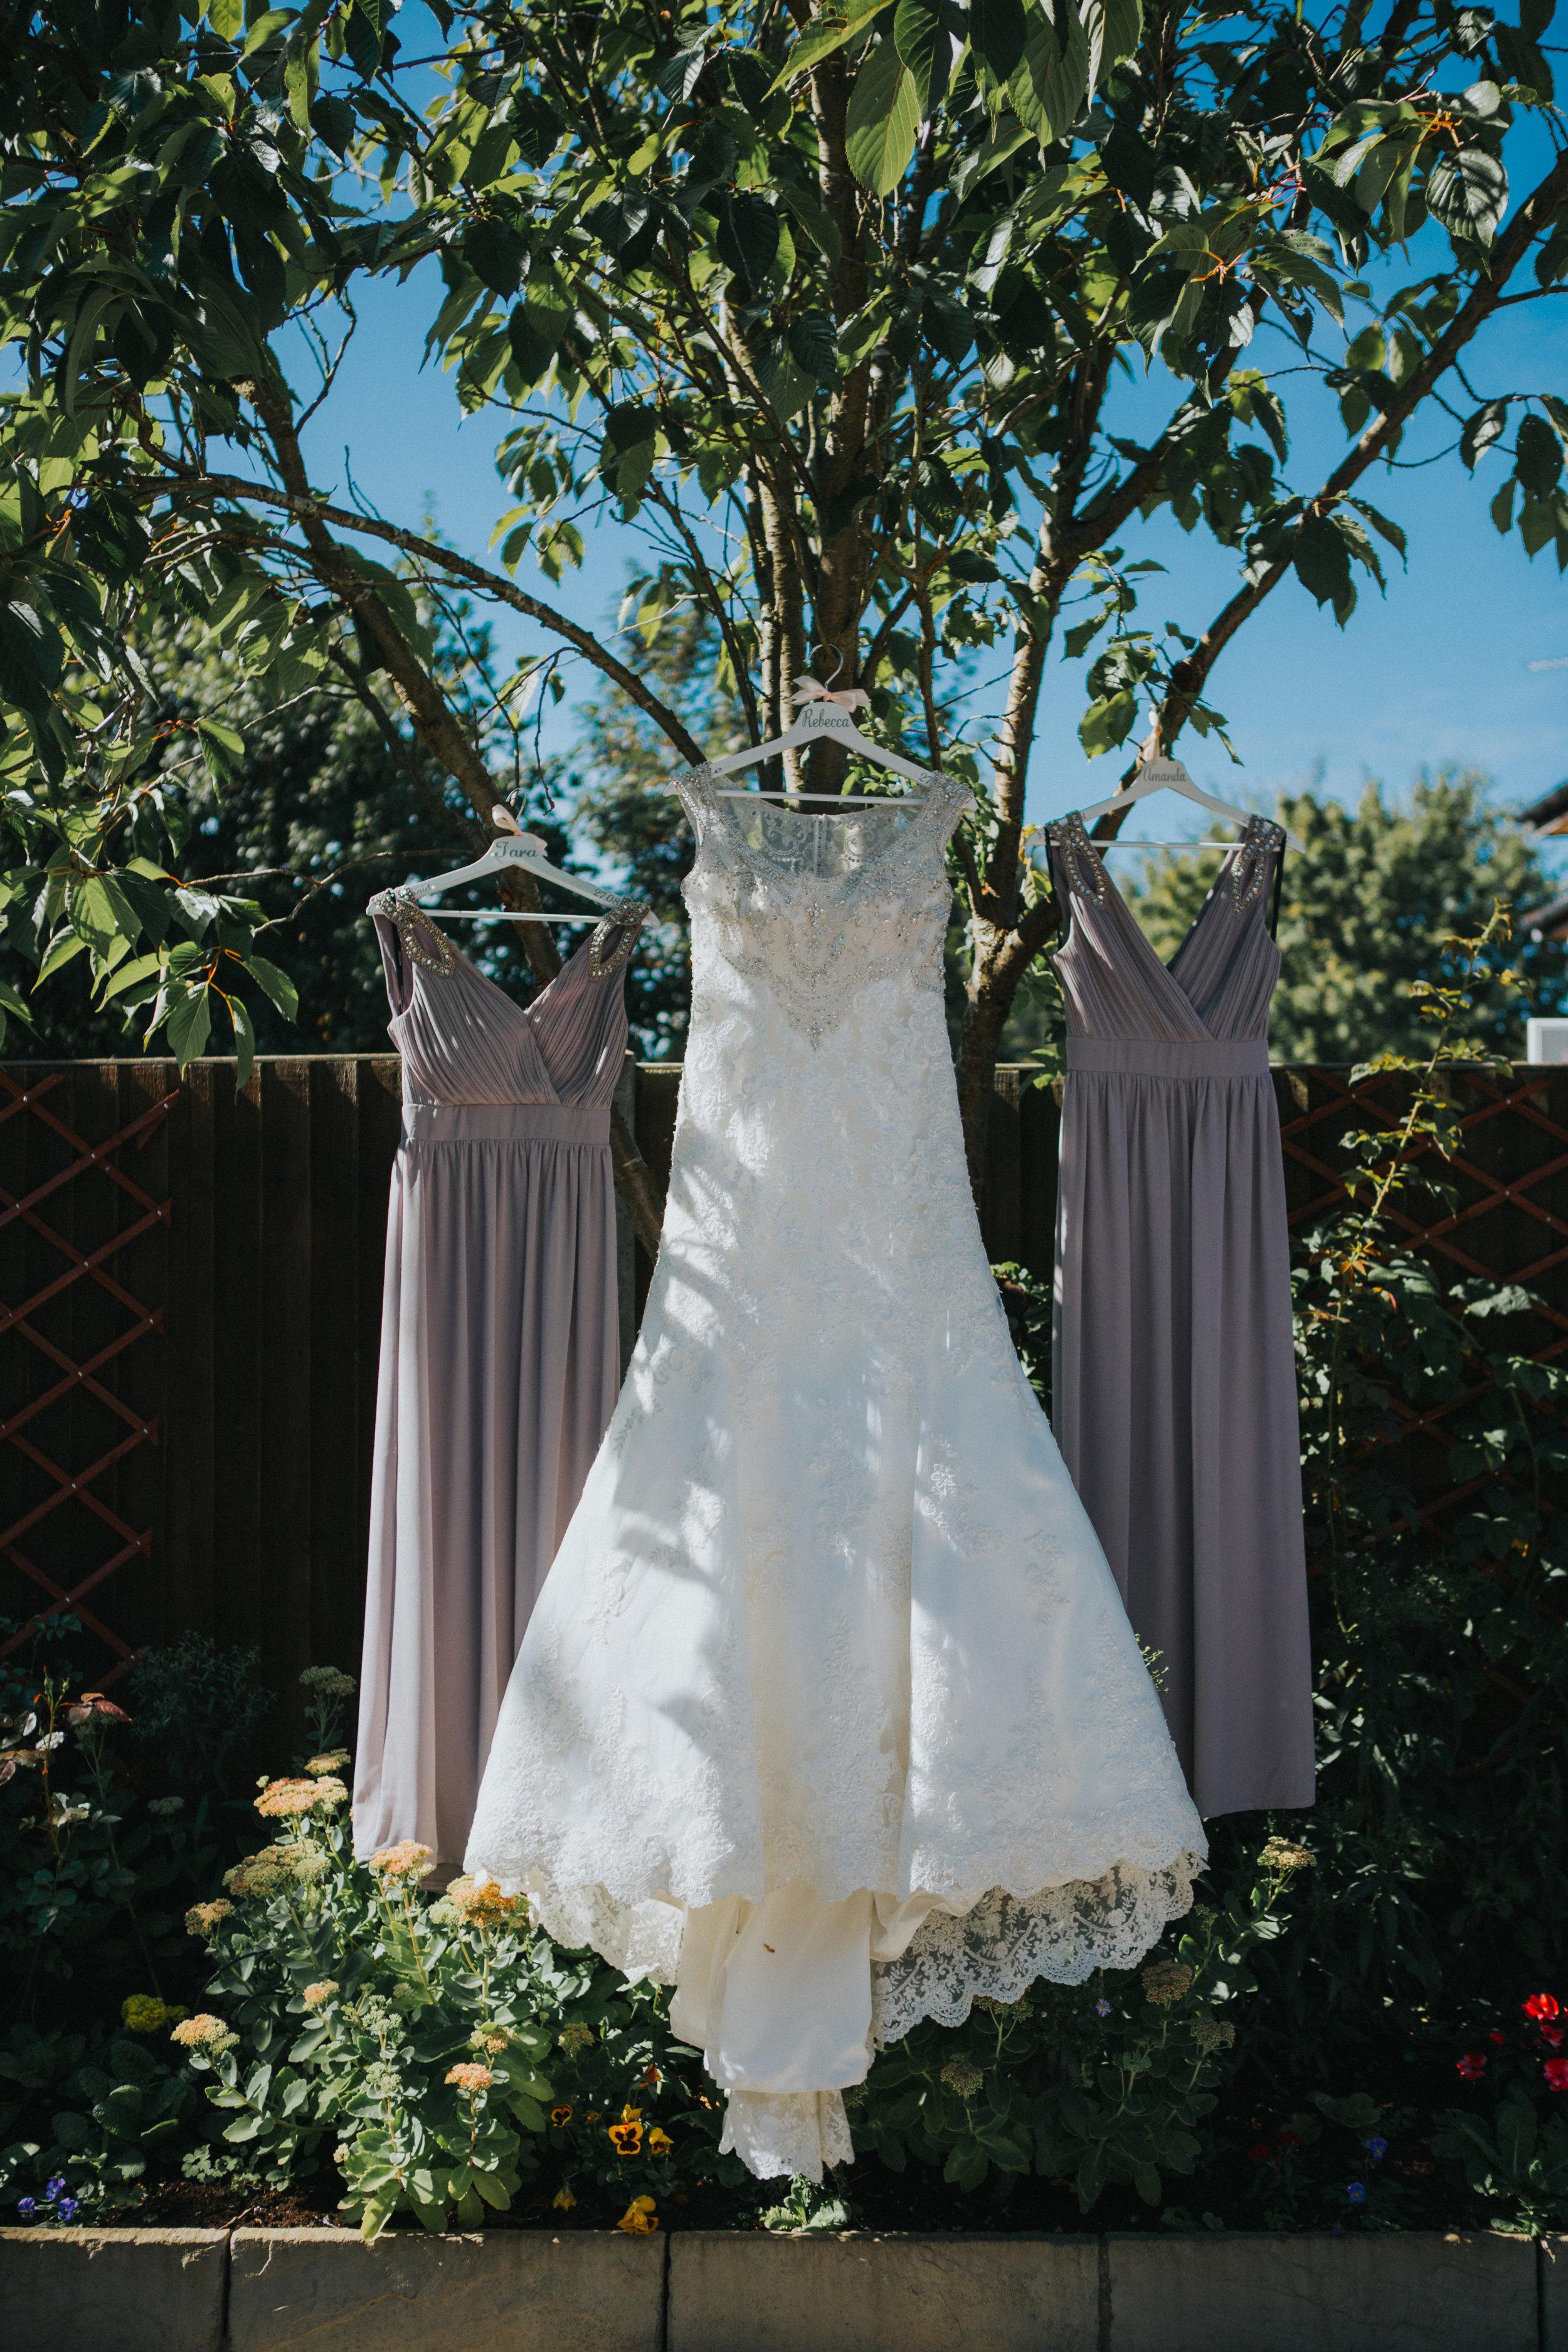 hertfordshire-hitchin-london-wedding-photography-St-bonaventures-catholic-church-bridal-prep-07